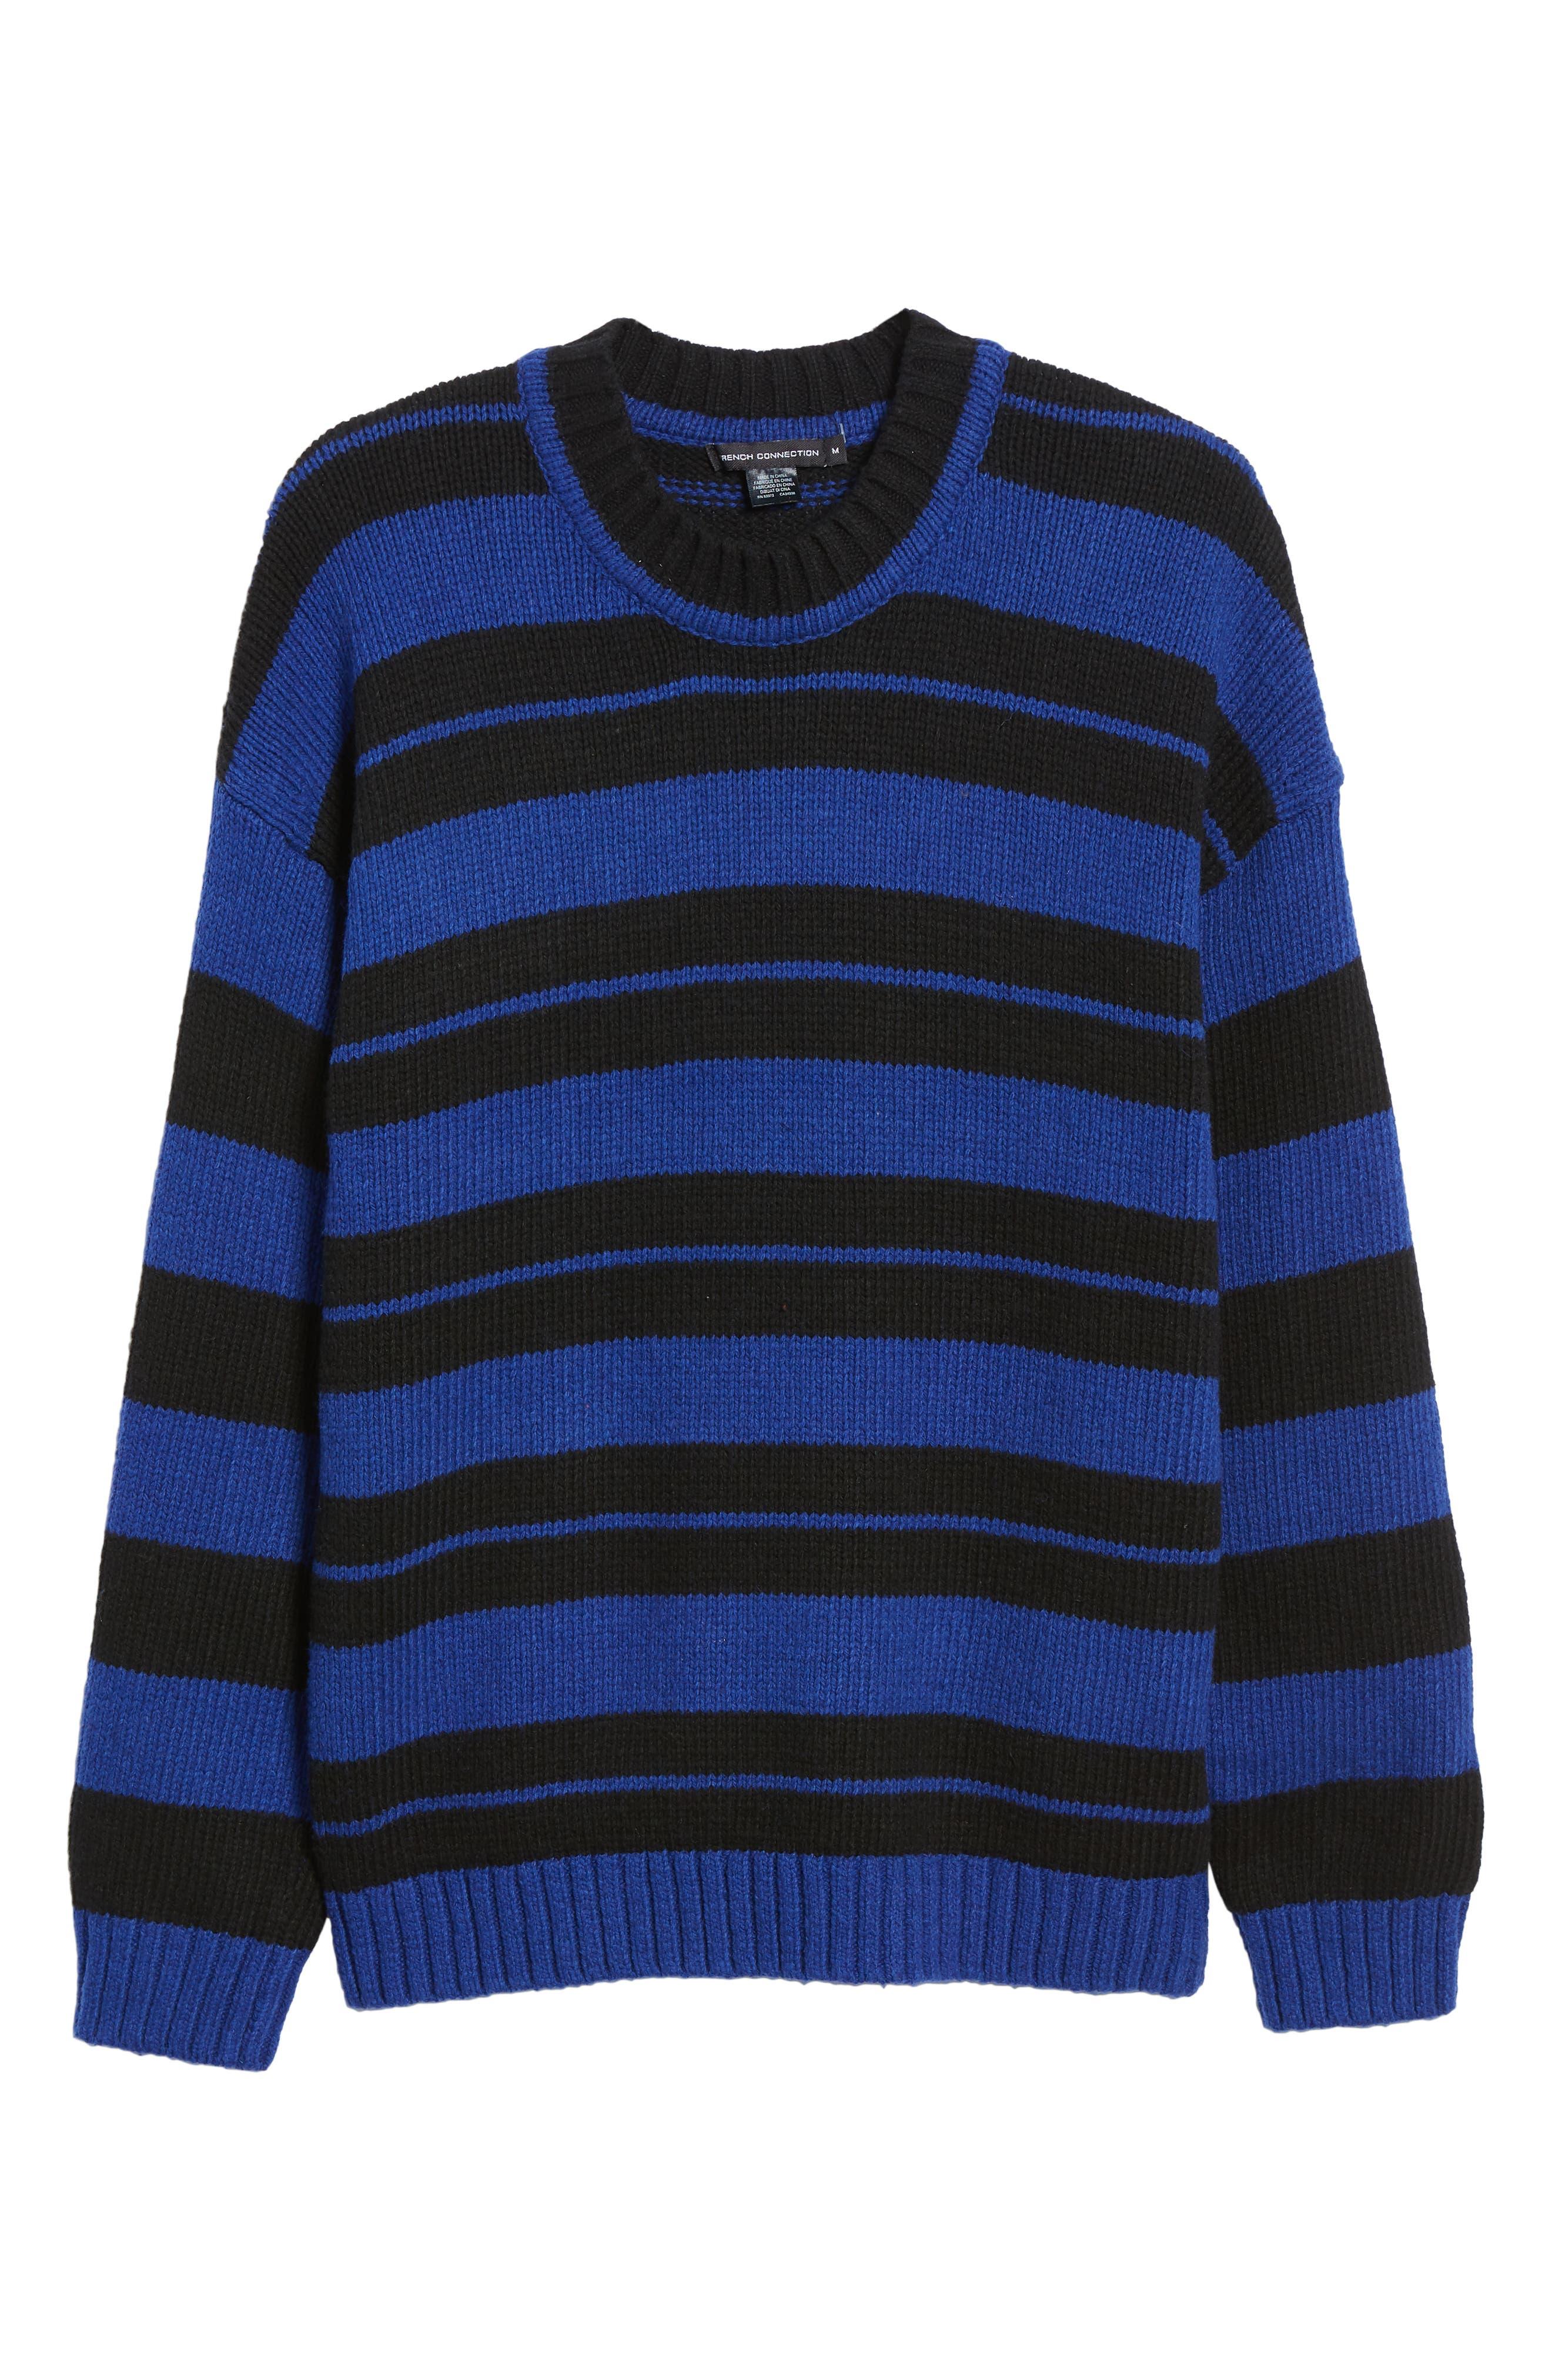 Regular Fit Varsity Stripe Sweater,                             Alternate thumbnail 6, color,                             FLURO BLUE BLACK